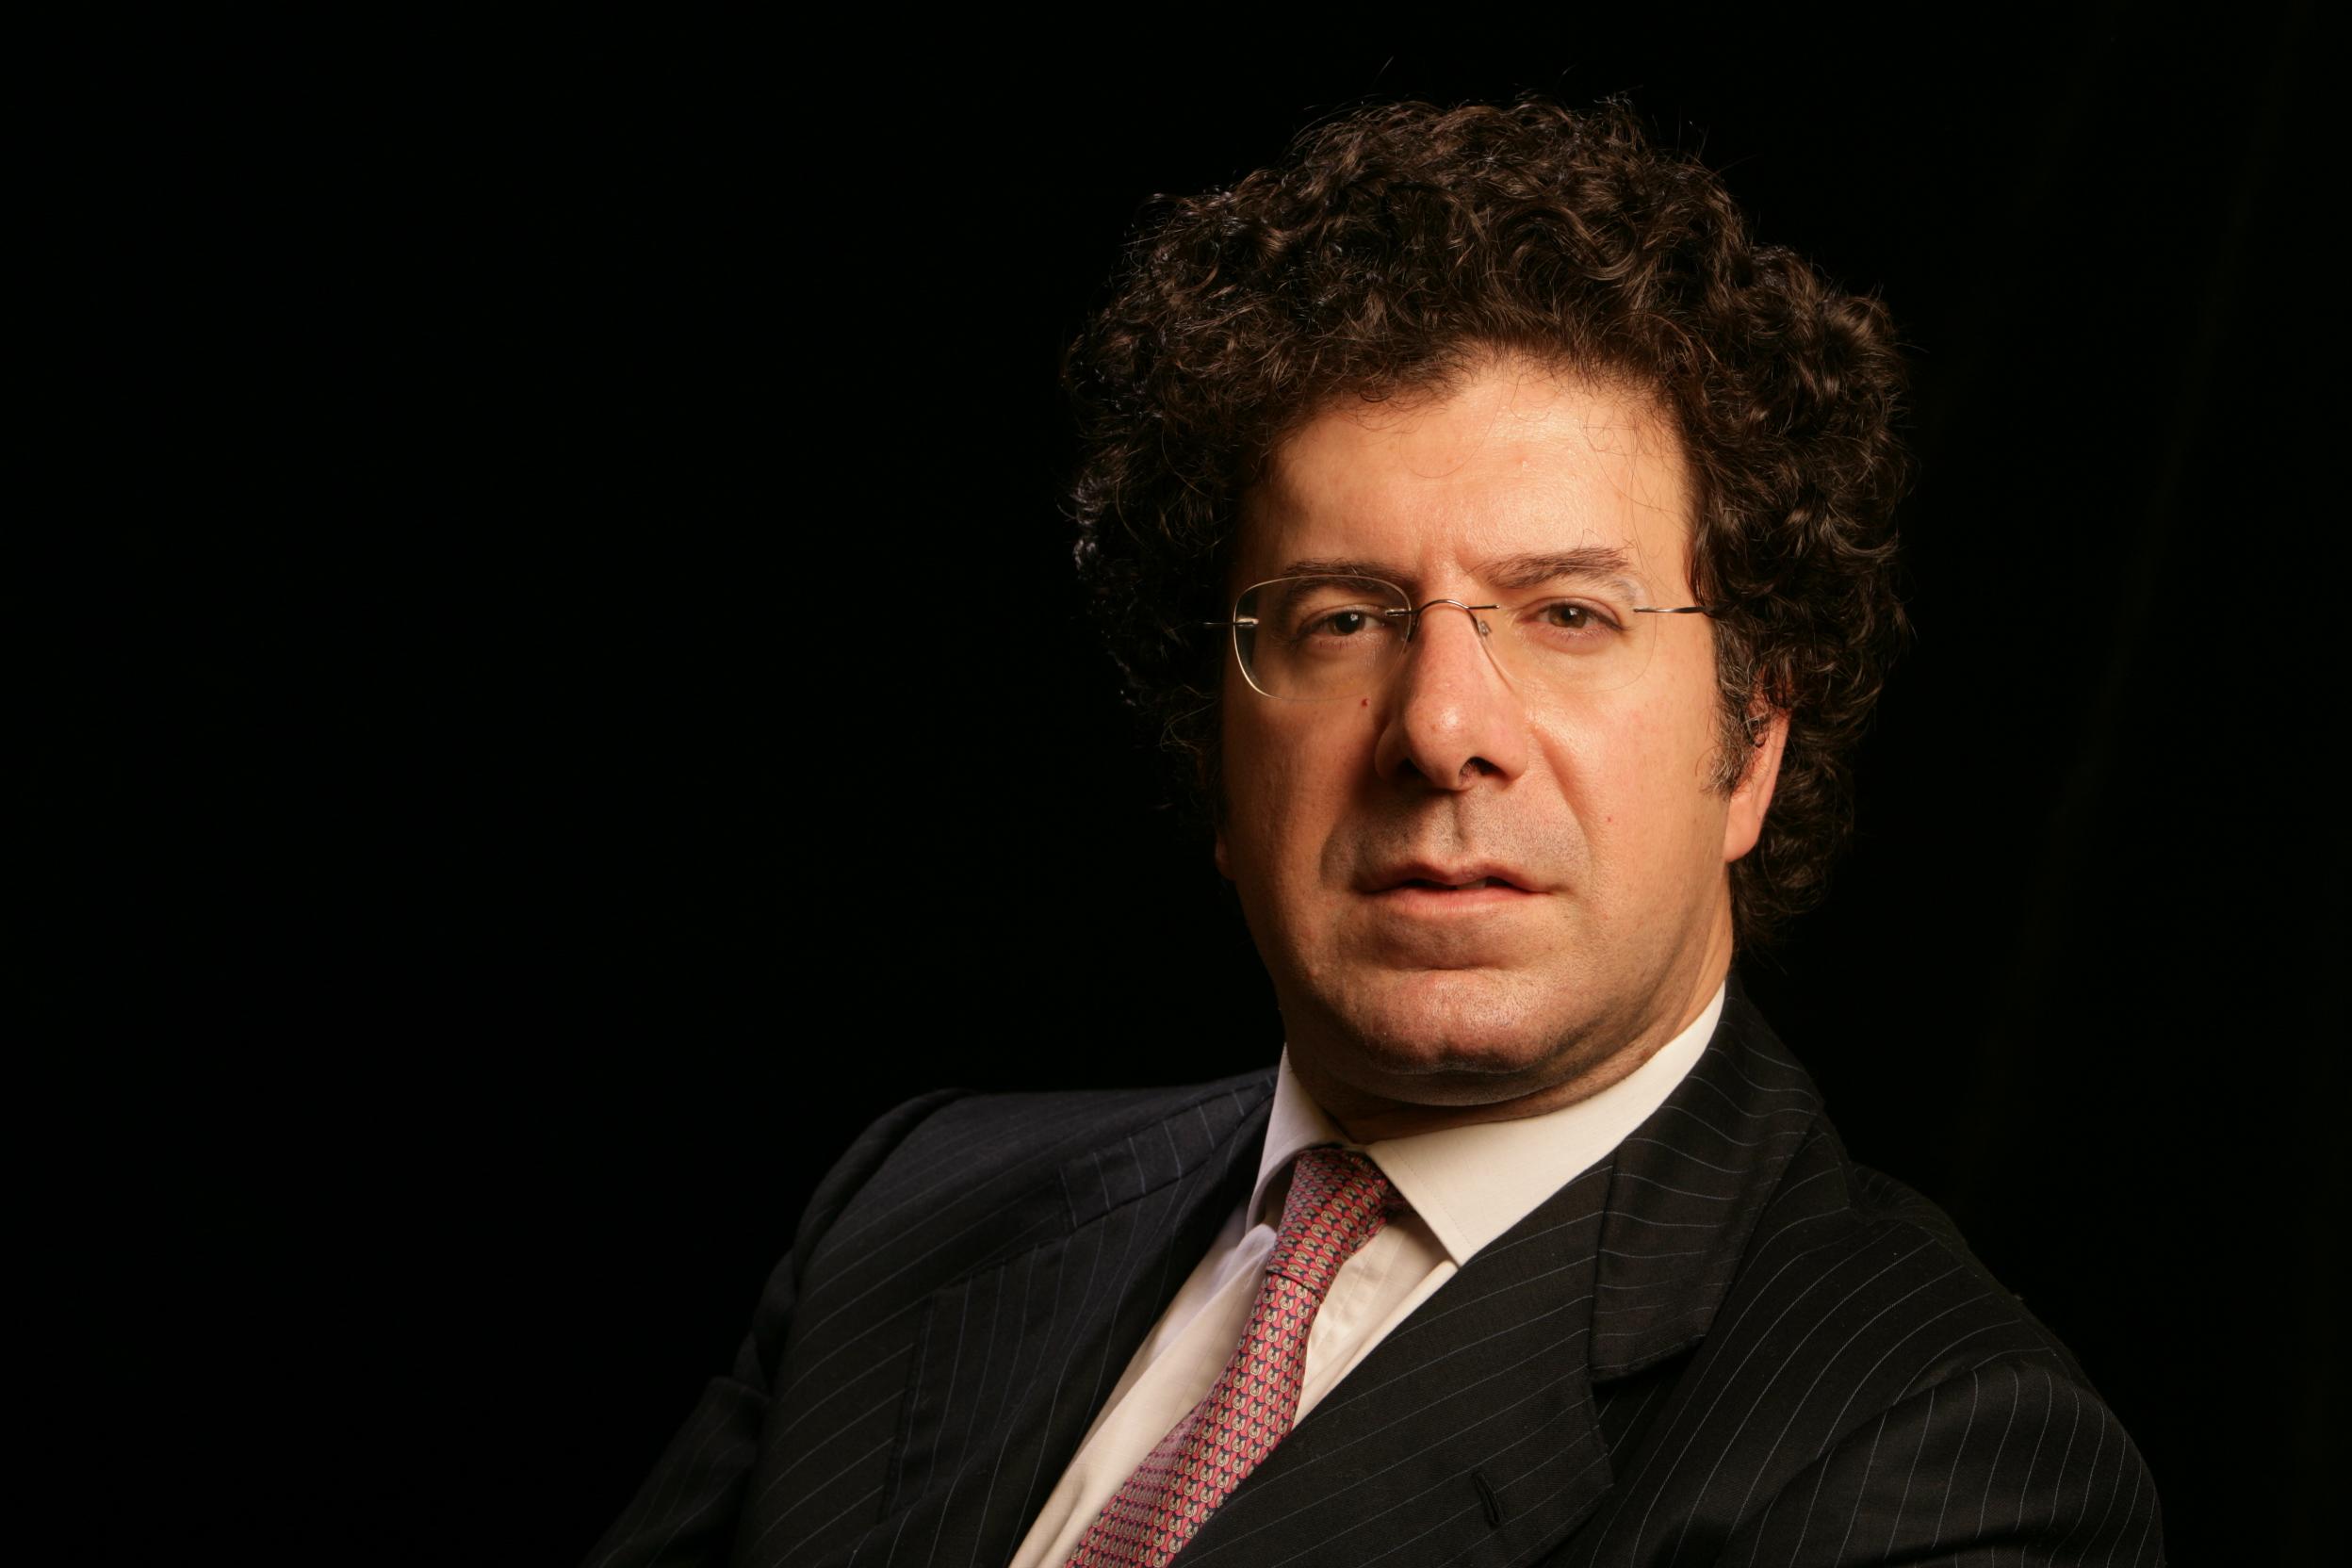 Avv. Massimo Sterpi